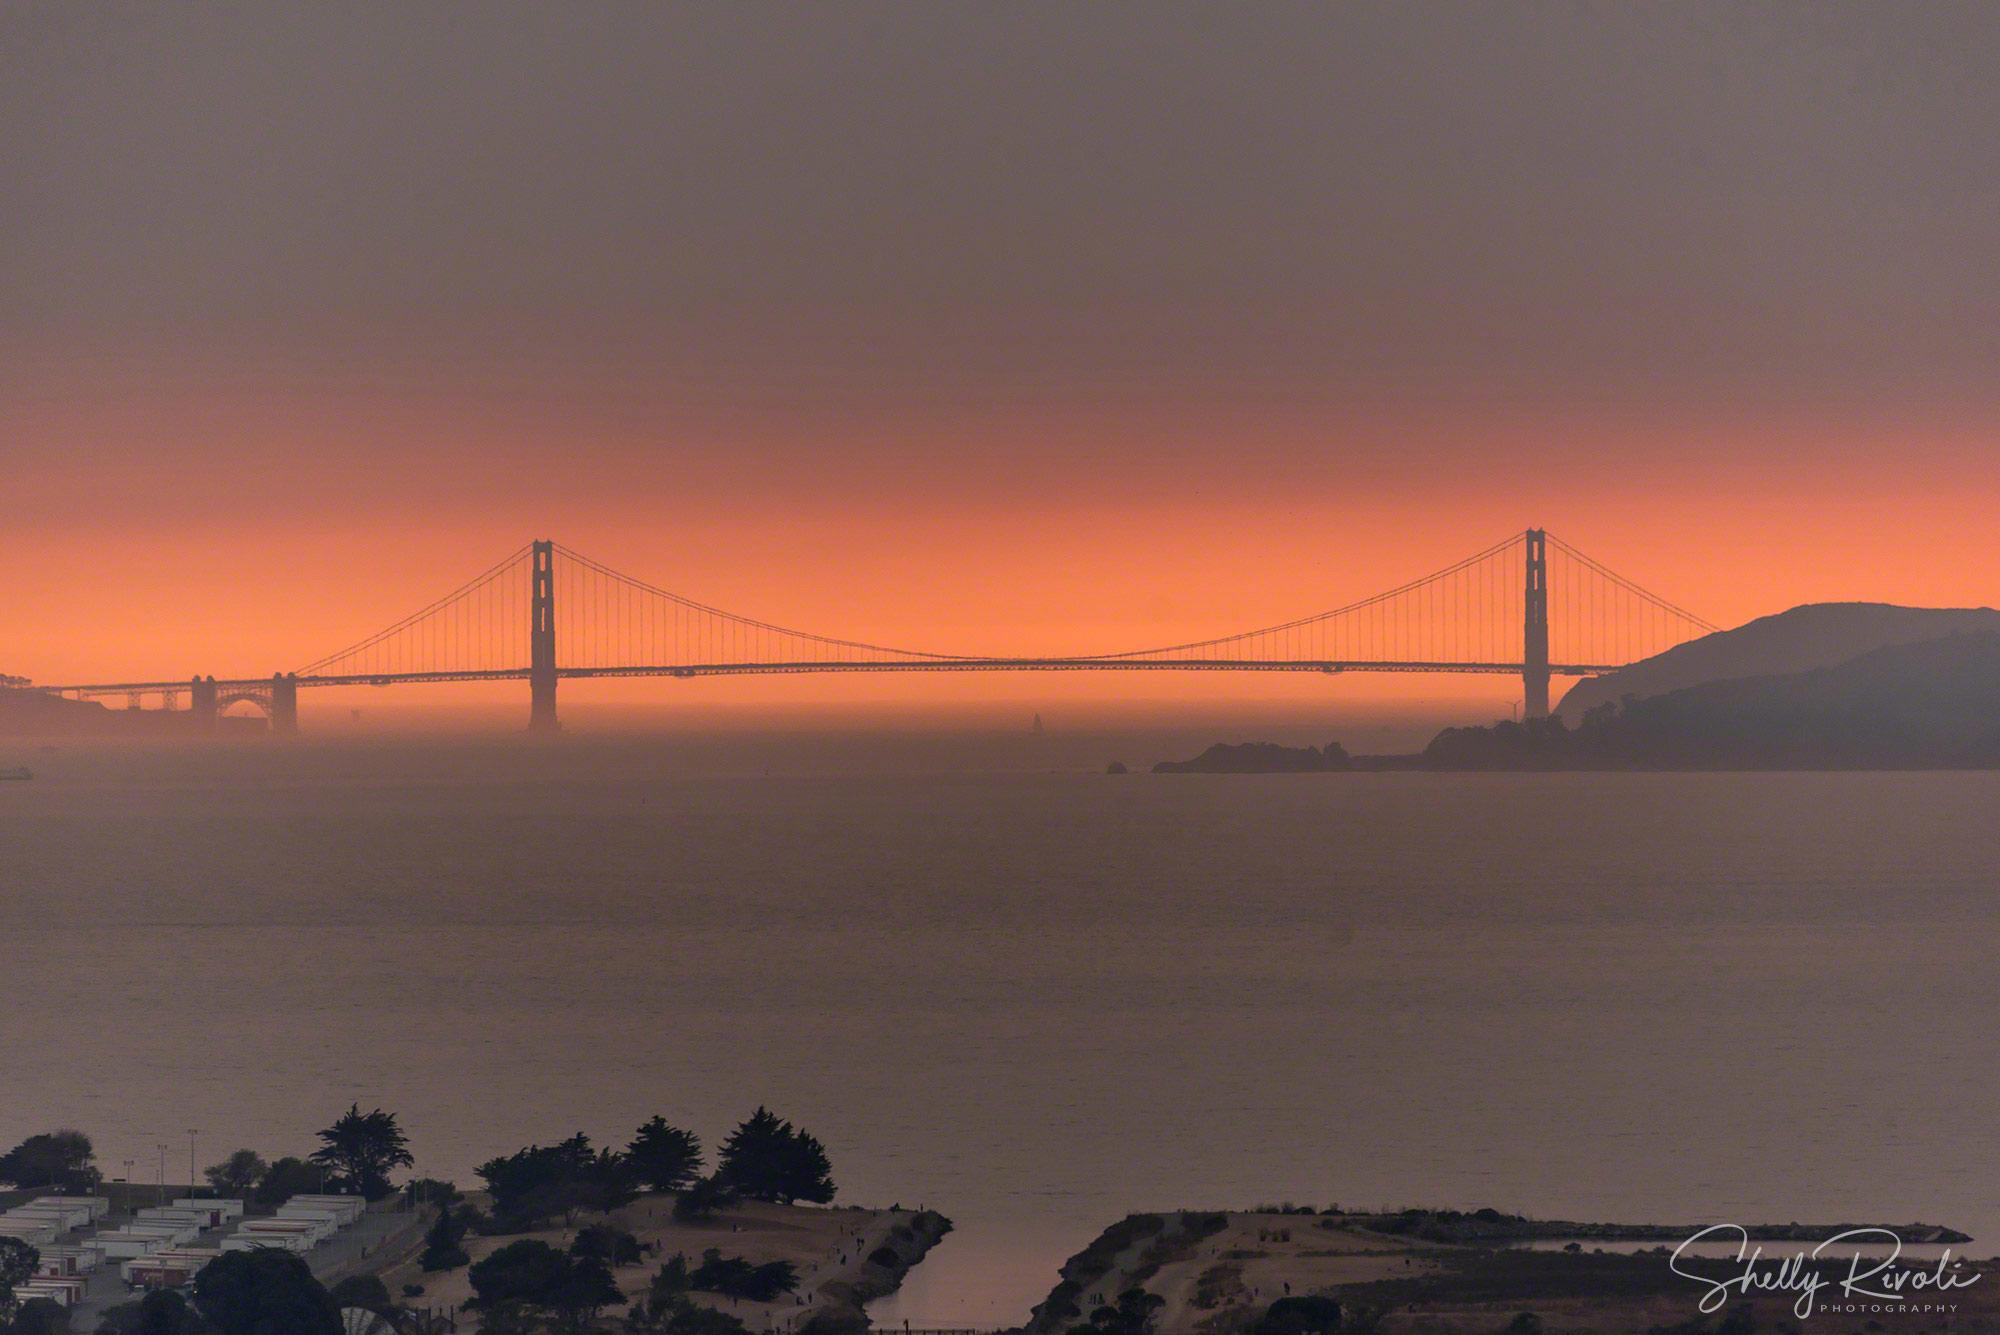 Eerie light through the Golden Gate Bridge on the evening of October 12, 2017.